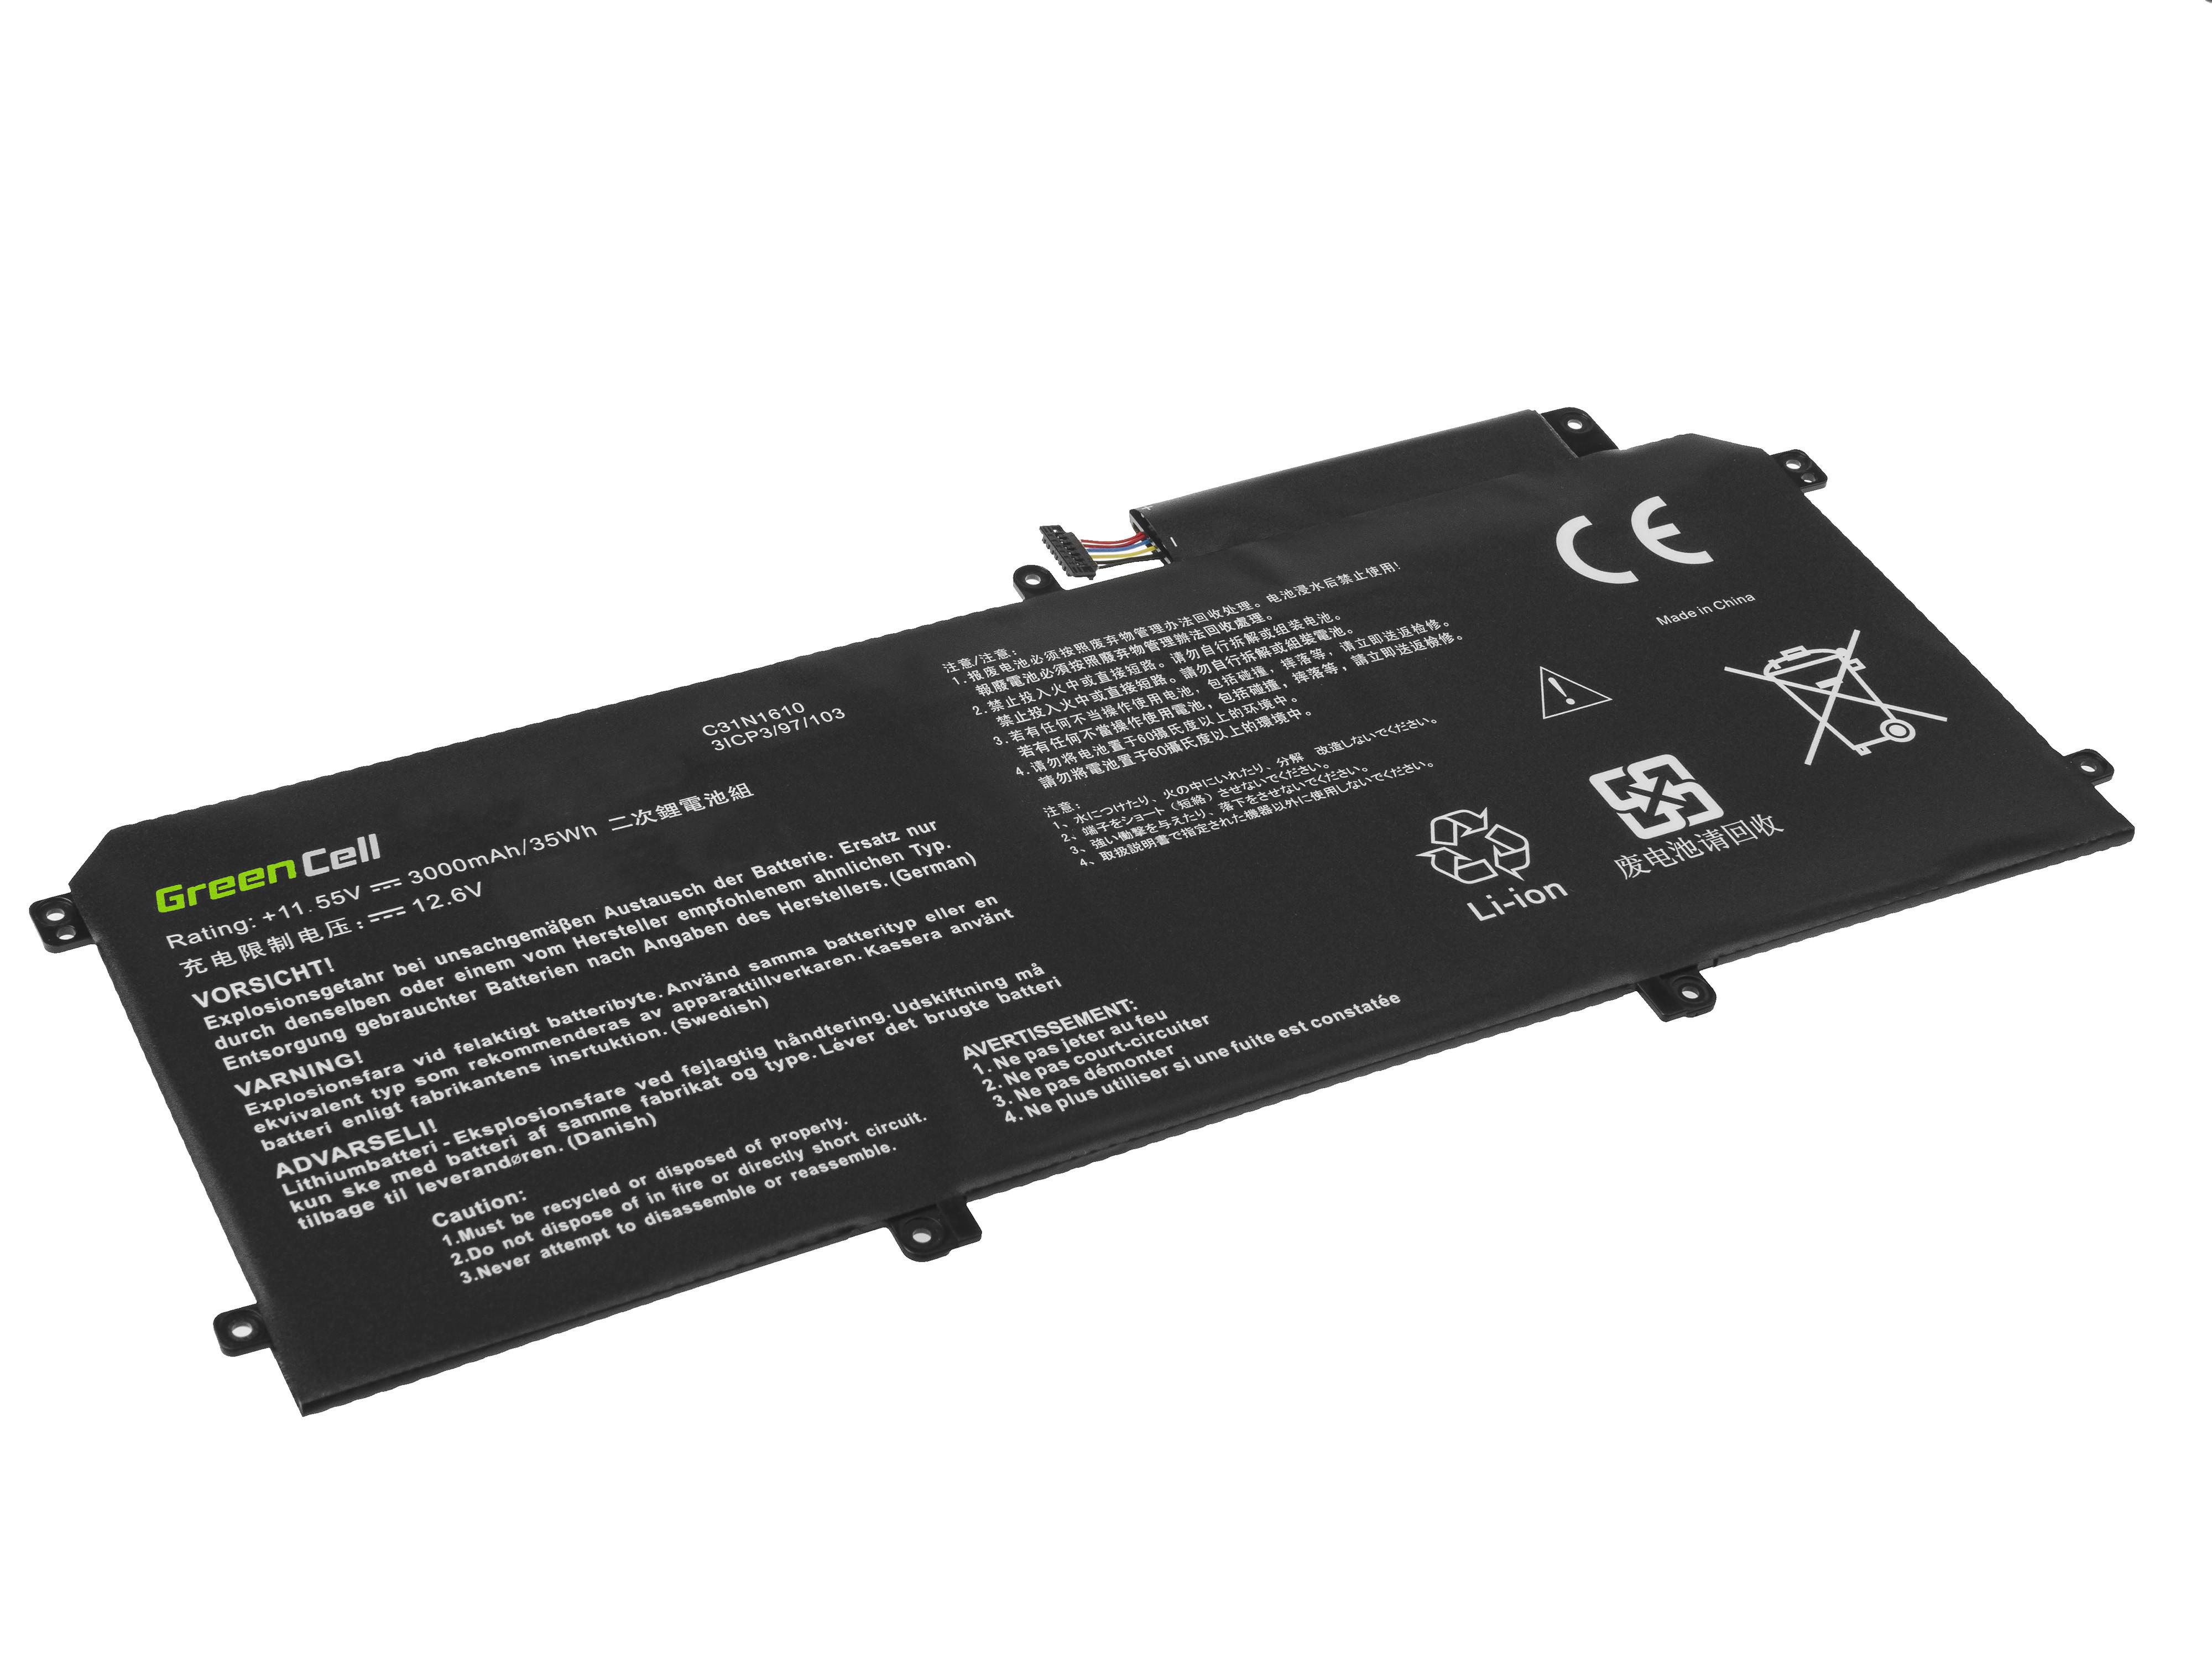 Green Cell AS139 Baterie Asus C31N1610 pro Asus ZenBook UX330C UX330CA 3000mAh Li-Pol – neoriginální